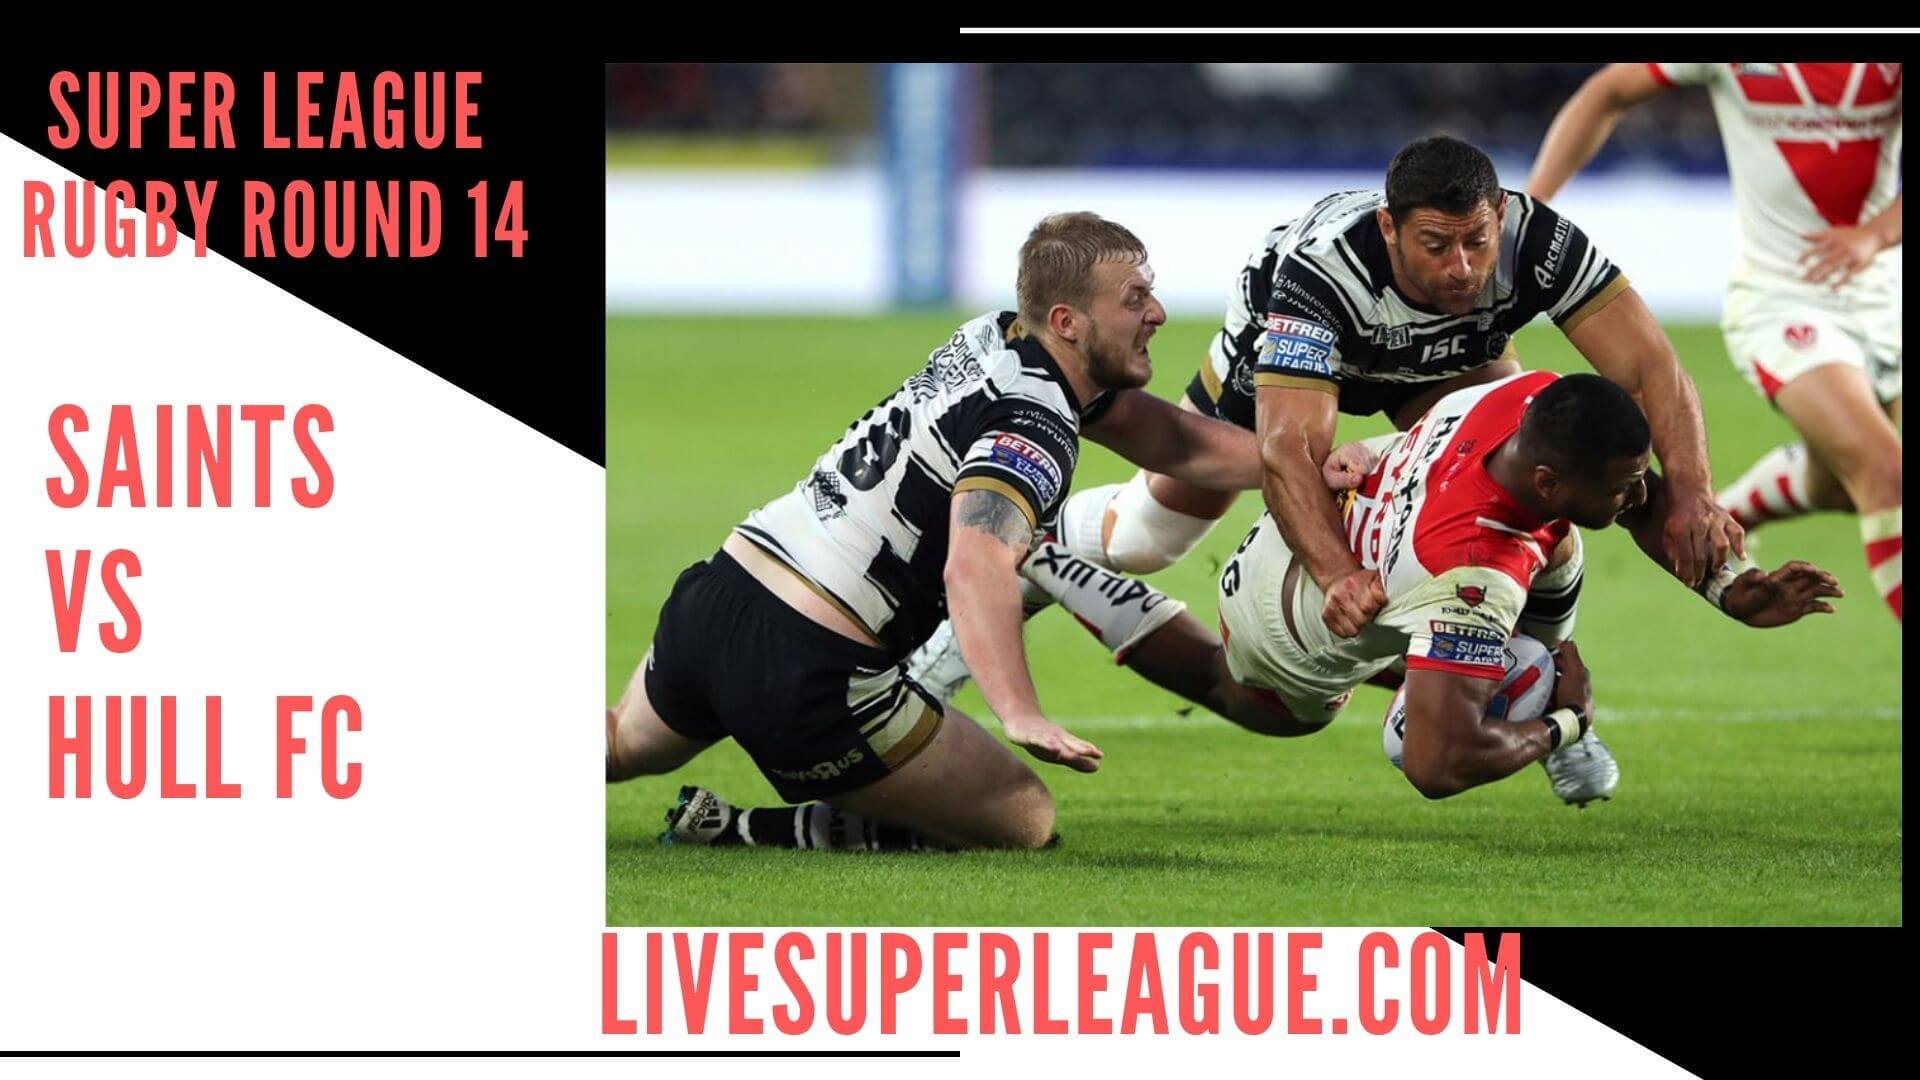 St Helens Vs Hull Fc Live Stream   Round 14